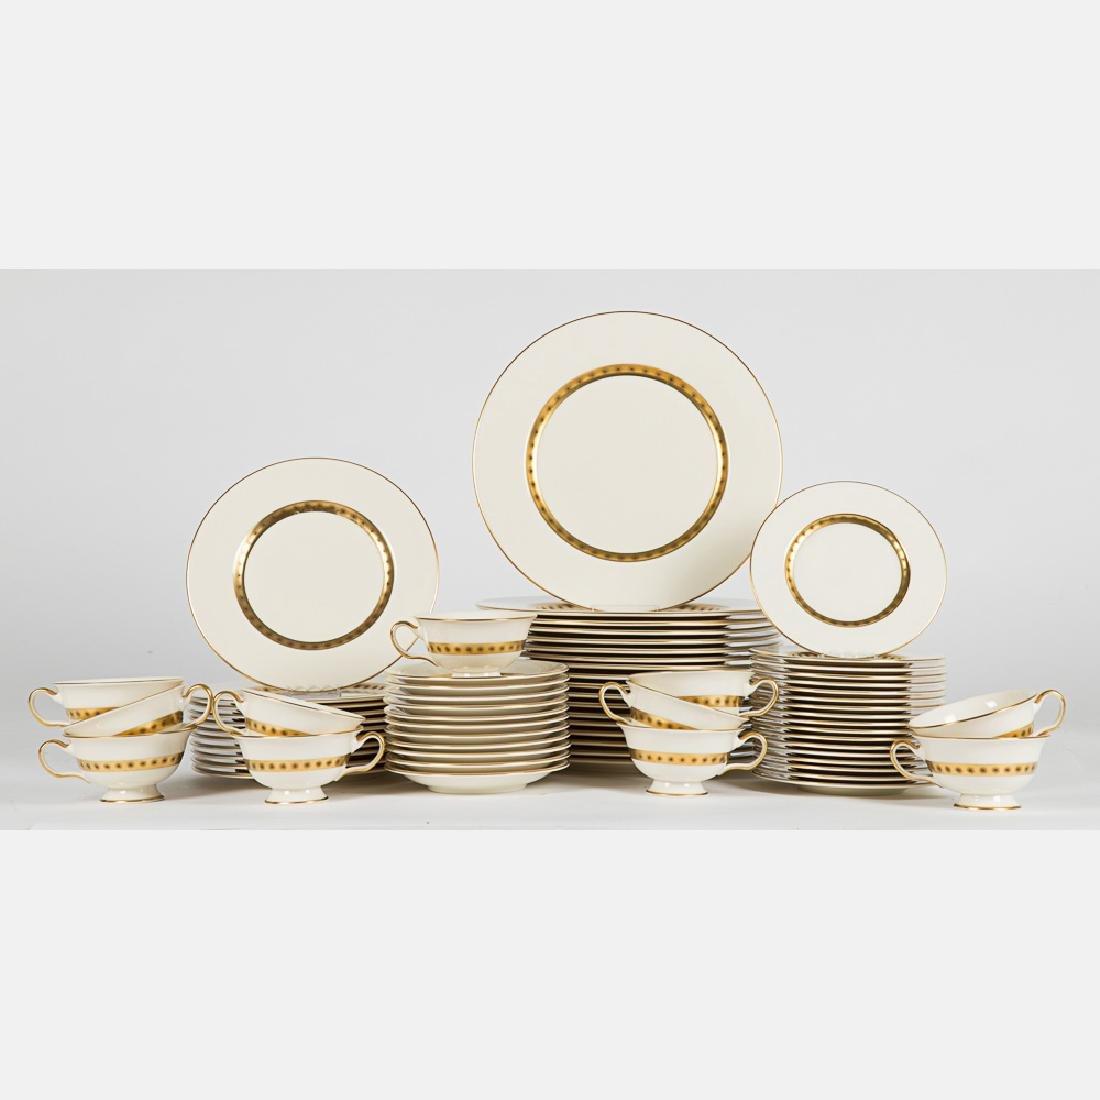 A Partial Castleton Porcelain Dinner Service in the